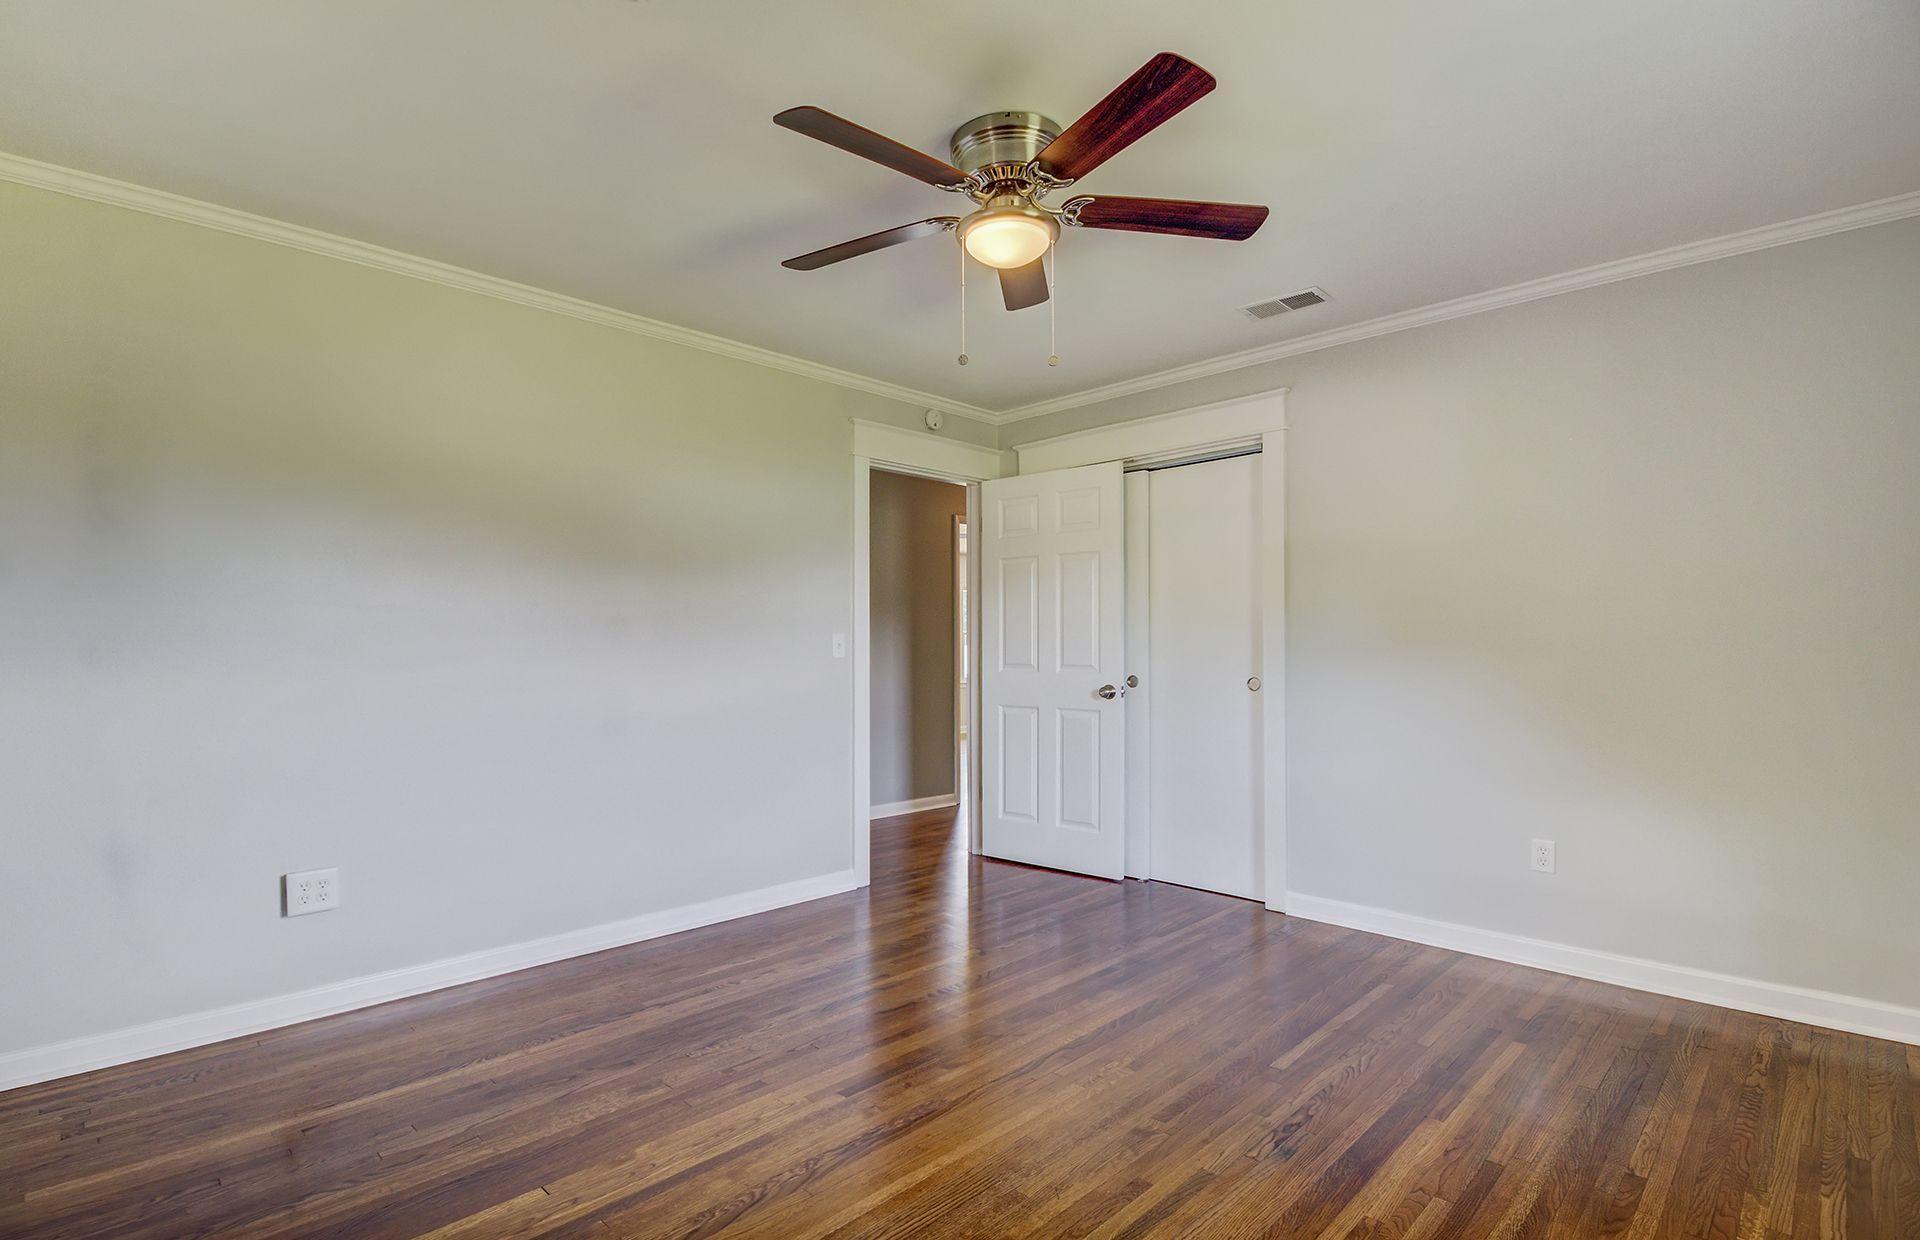 Belvedere Estates Homes For Sale - 6010 Ridgecrest, Hanahan, SC - 17